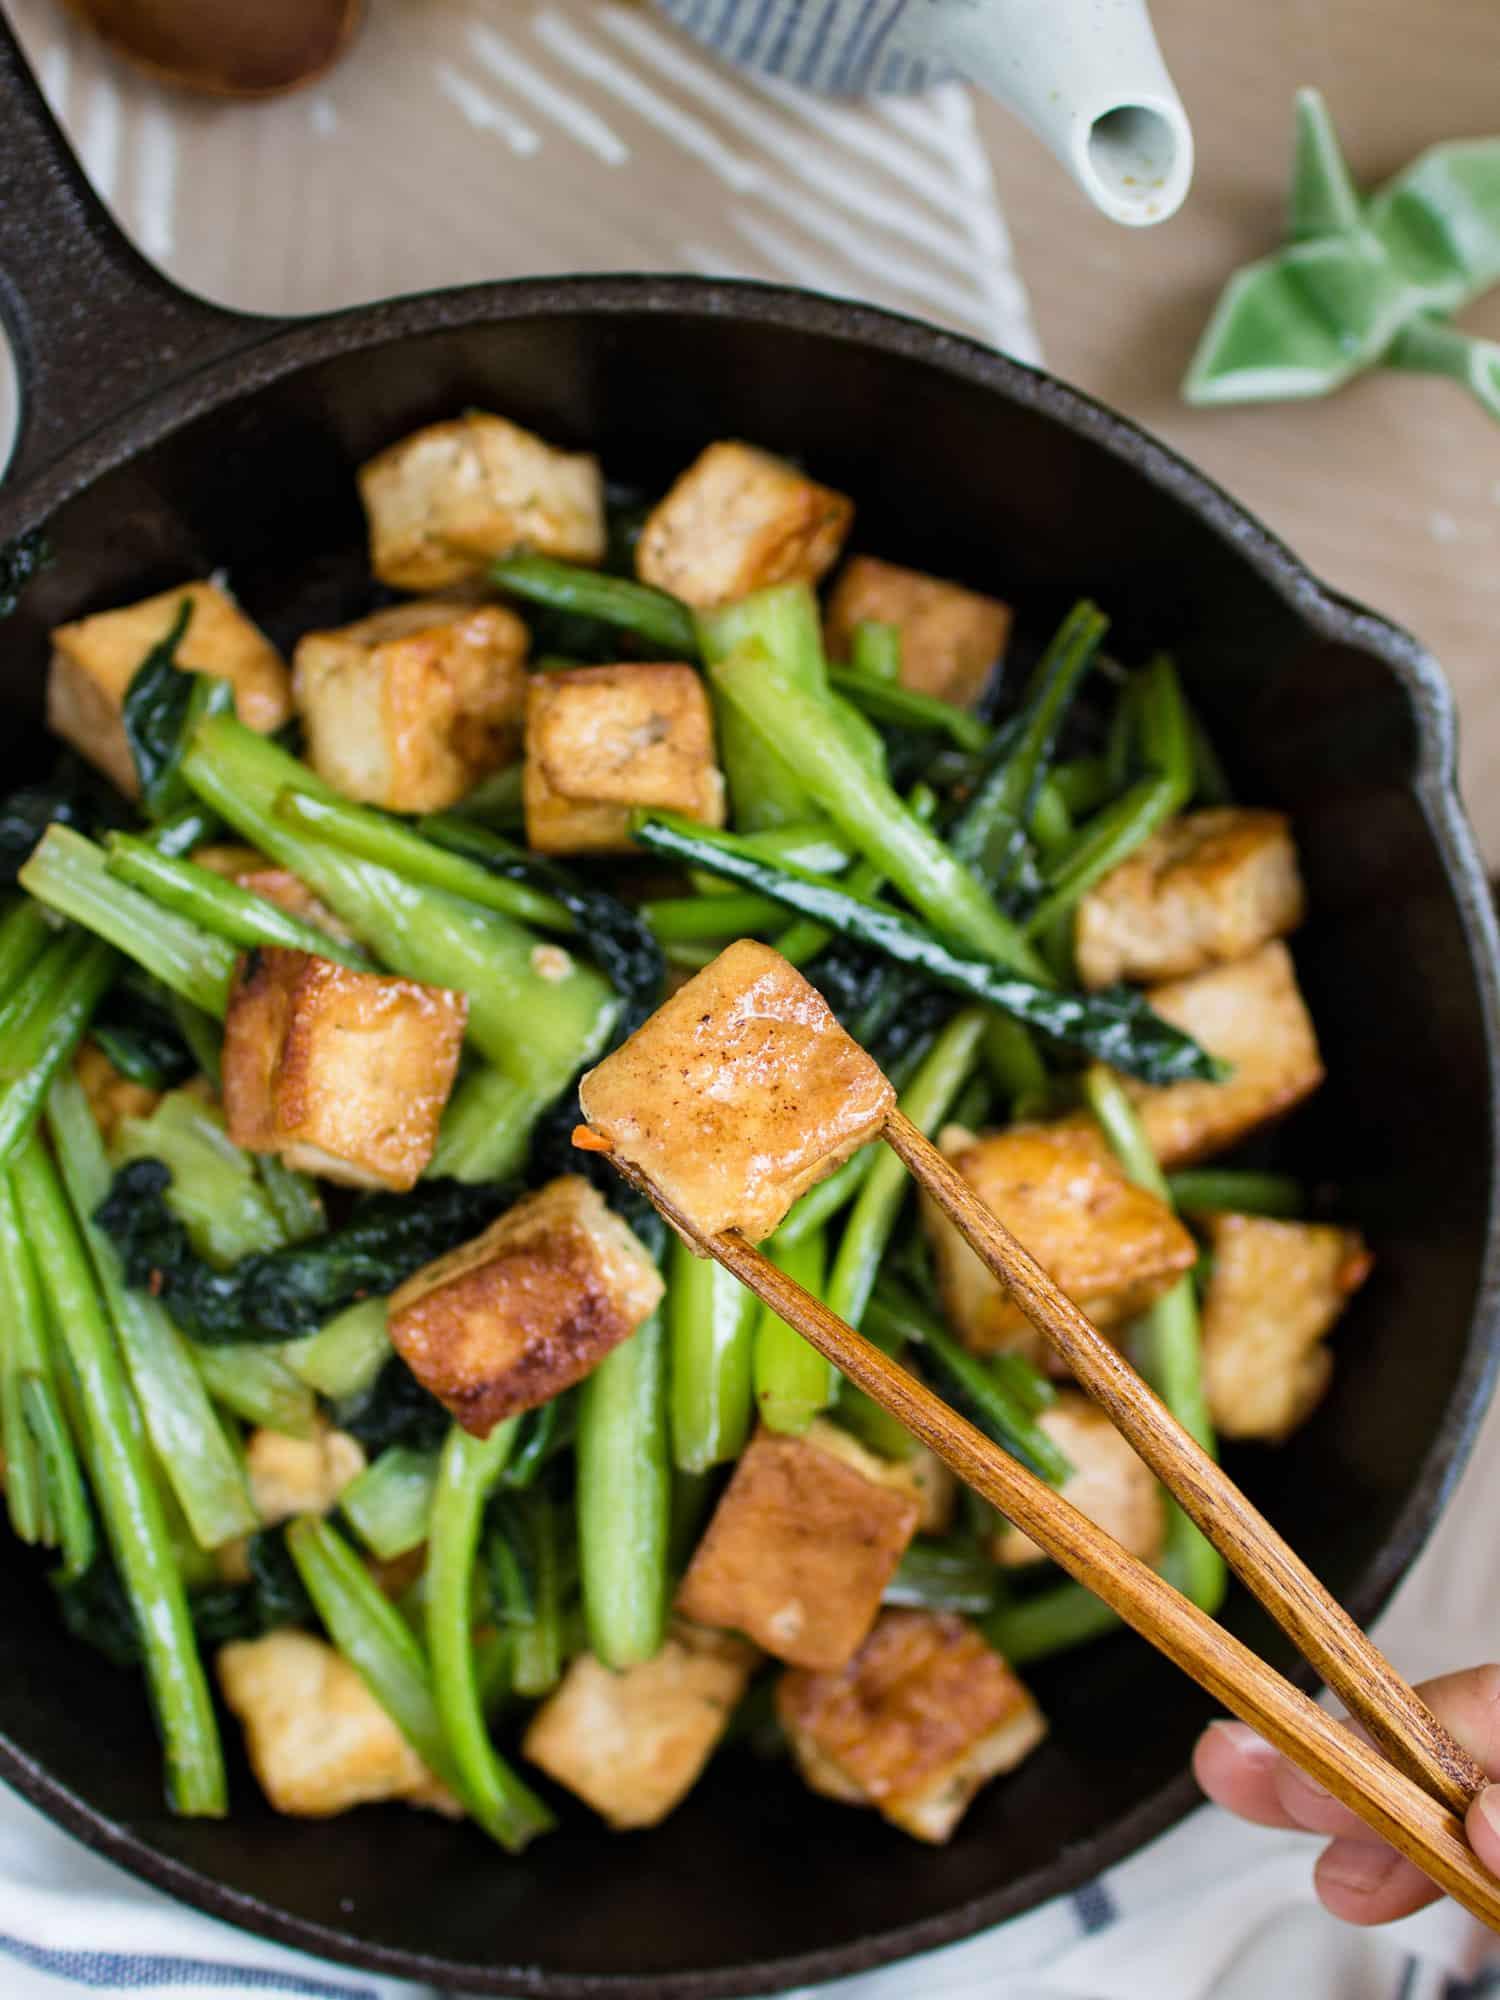 Choy sum hinese-stir and tofu in garlic sauce 1